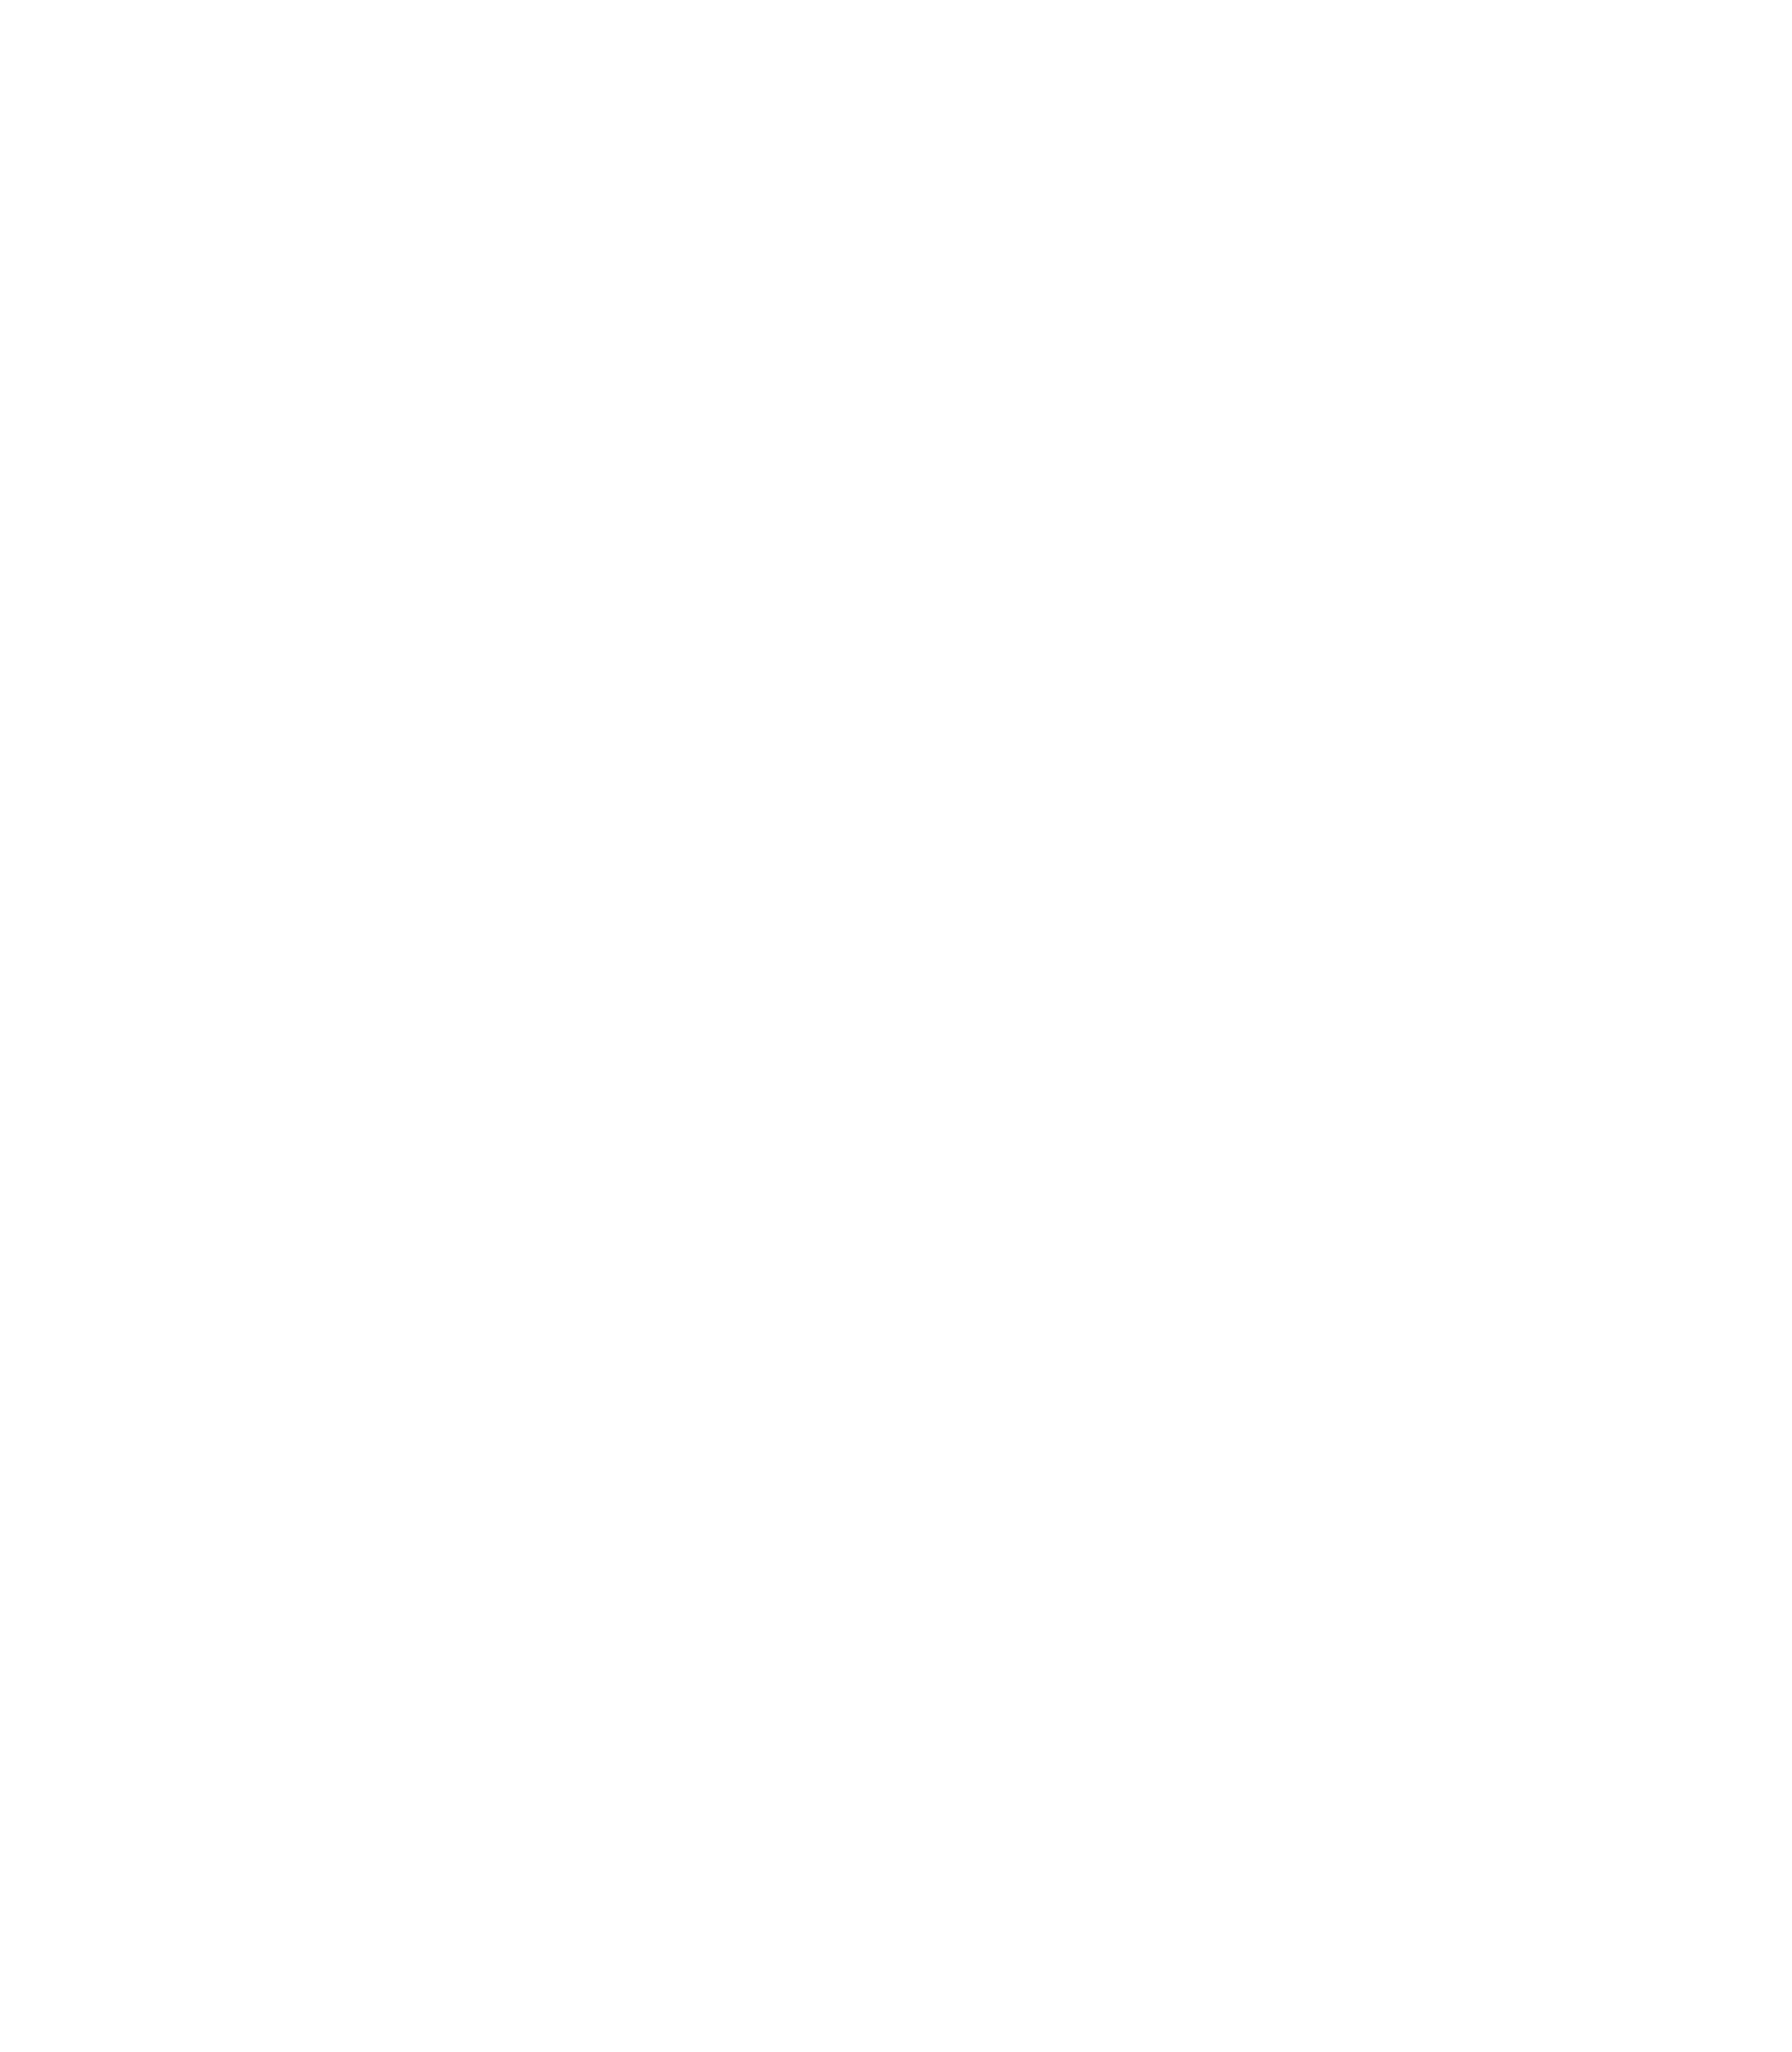 logo-whitegras.png